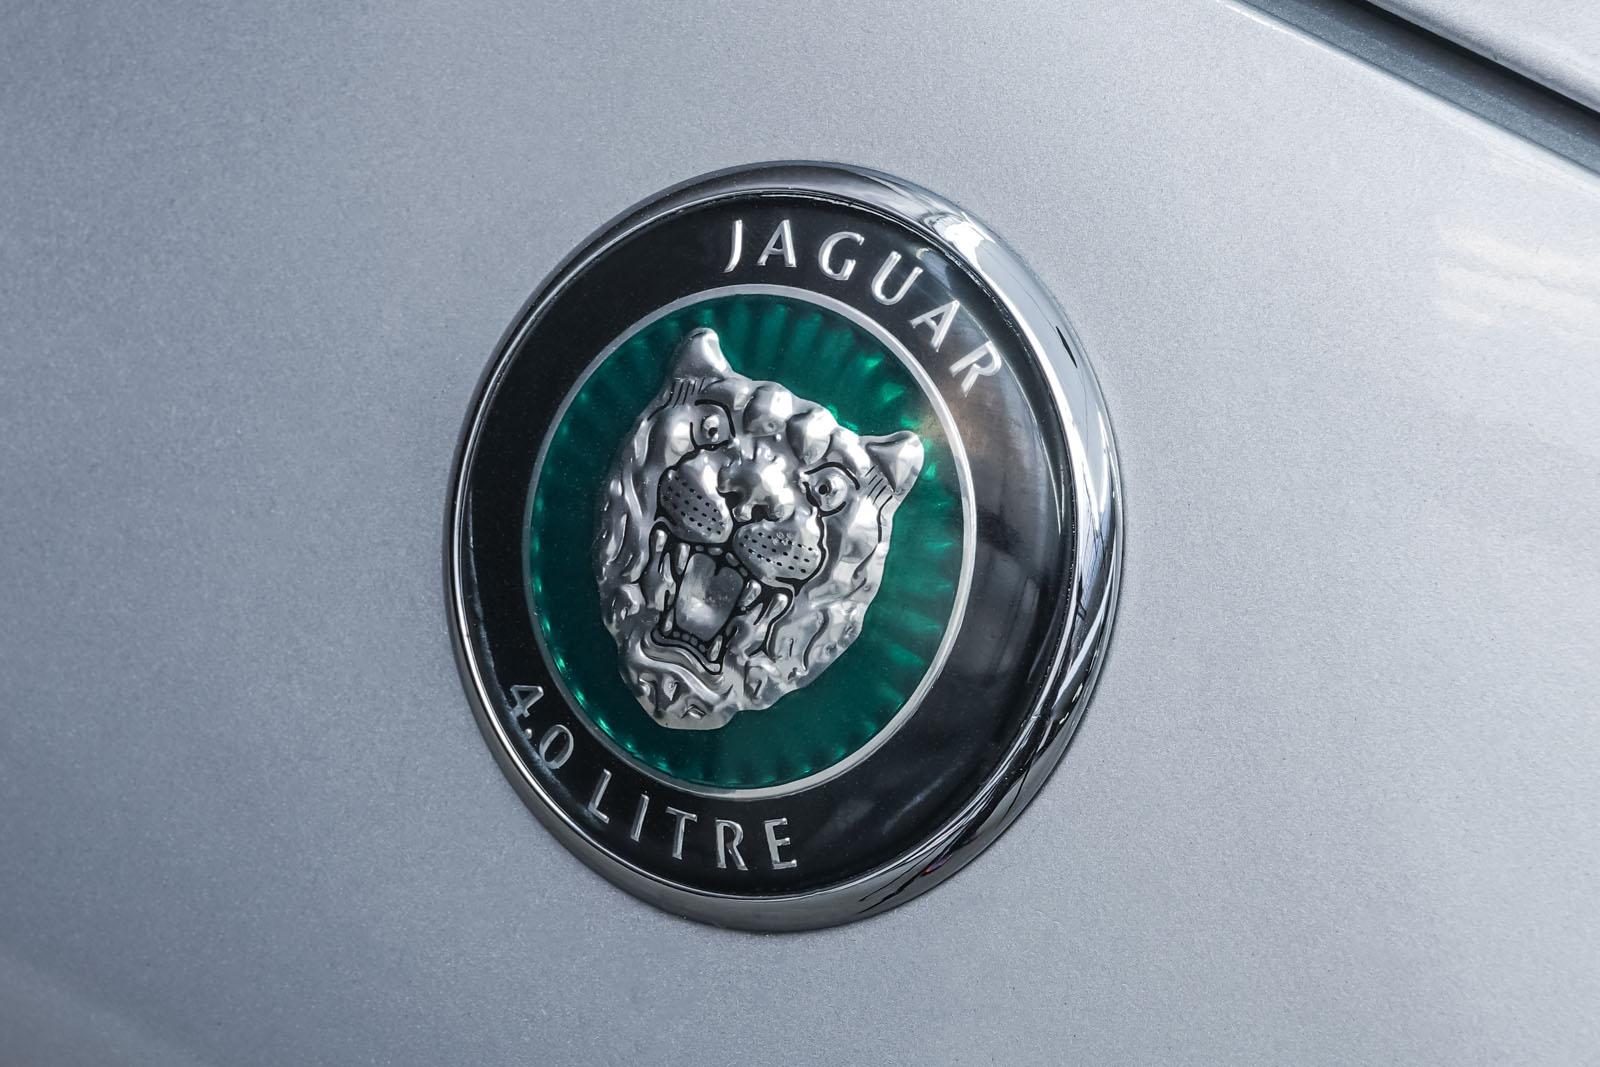 Jaguar_XK8_4.0_Silber_Schwarz_JAG-9731_13_w